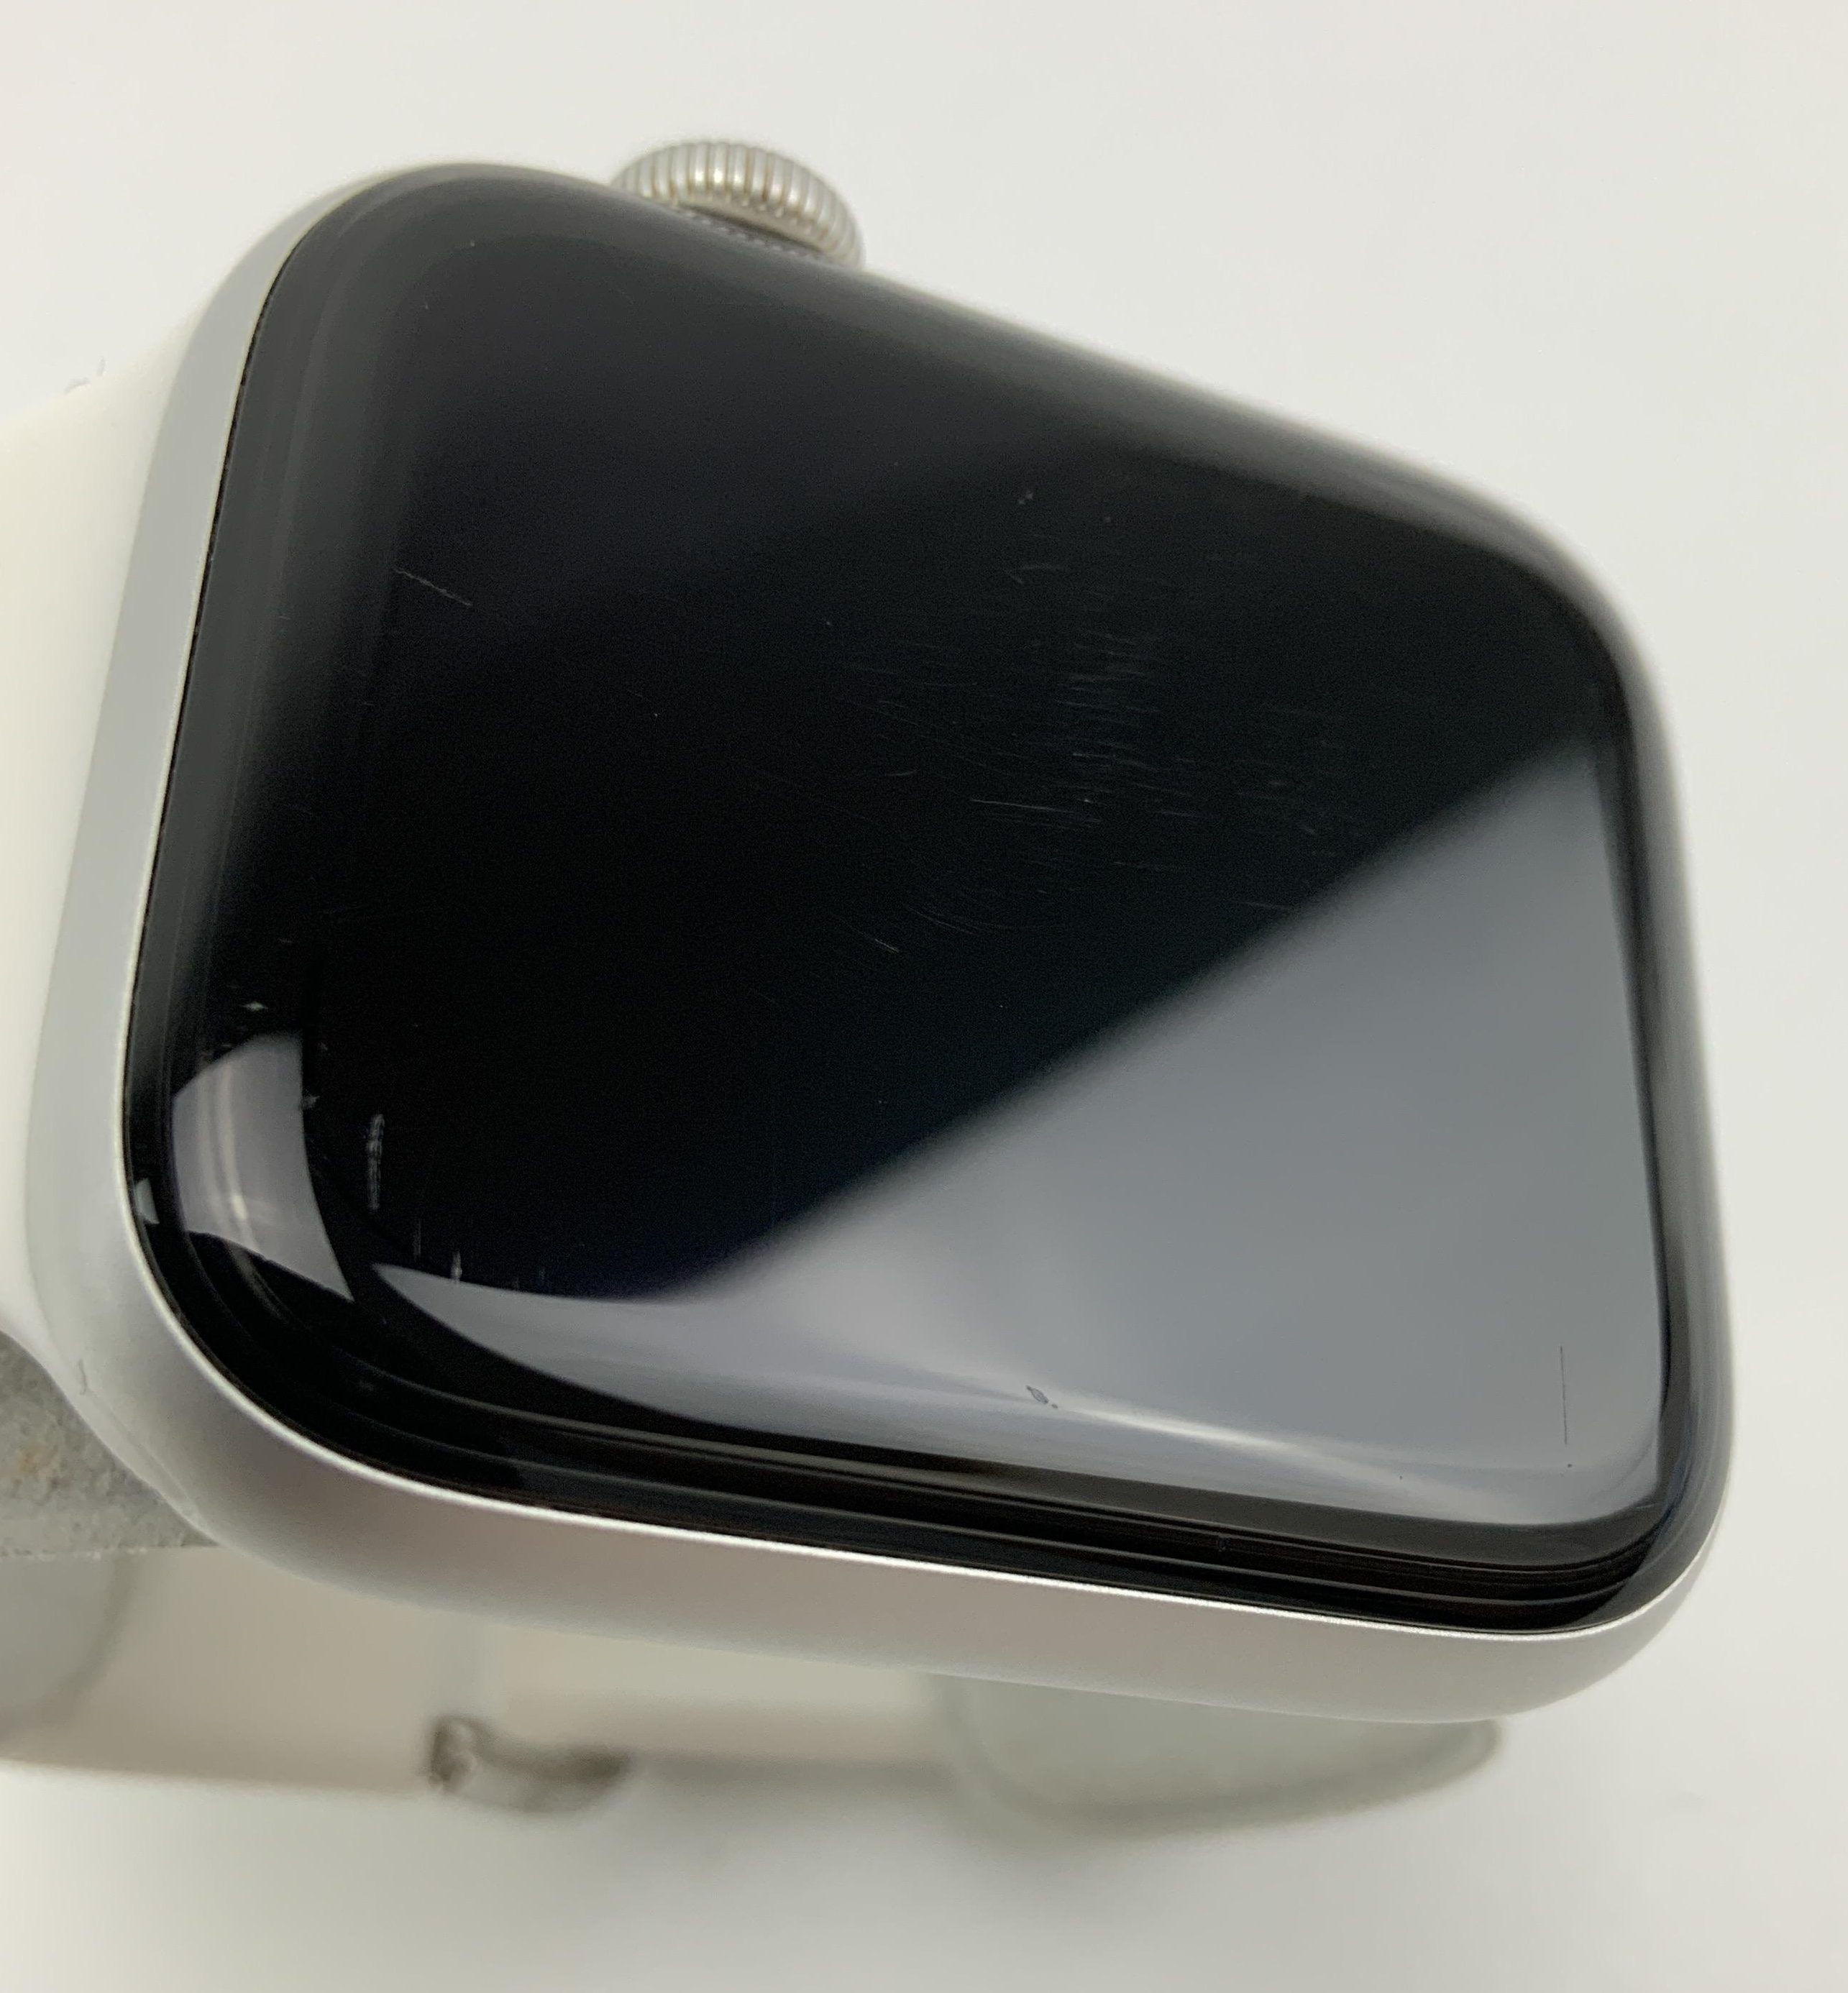 Watch Series 6 Aluminum Cellular (44mm), Silver, Afbeelding 2